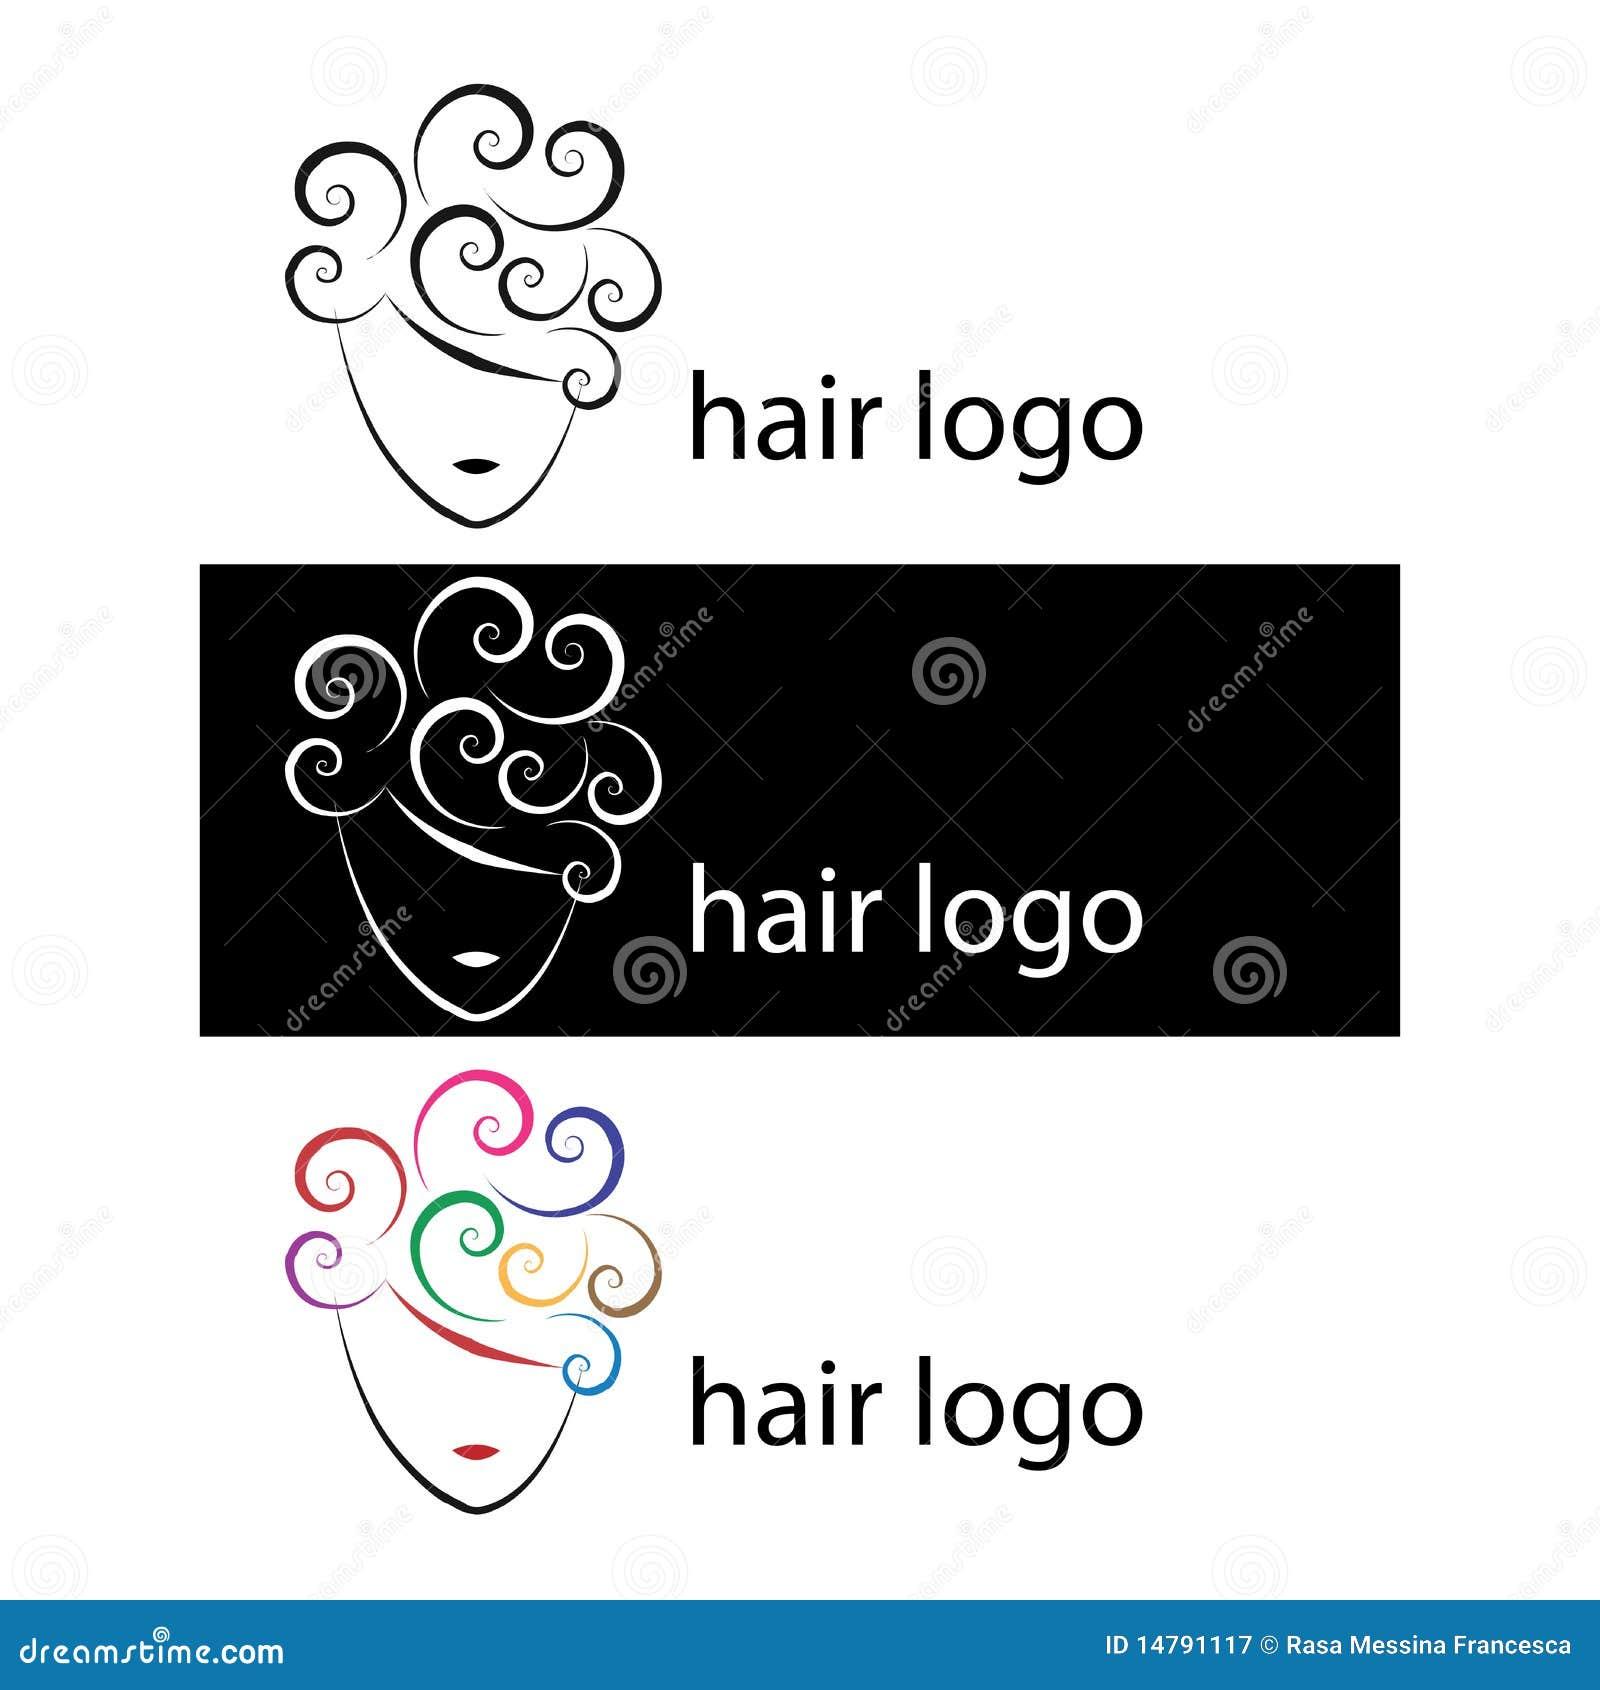 Hair Logos Royalty Free Stock Photography Image 14791117